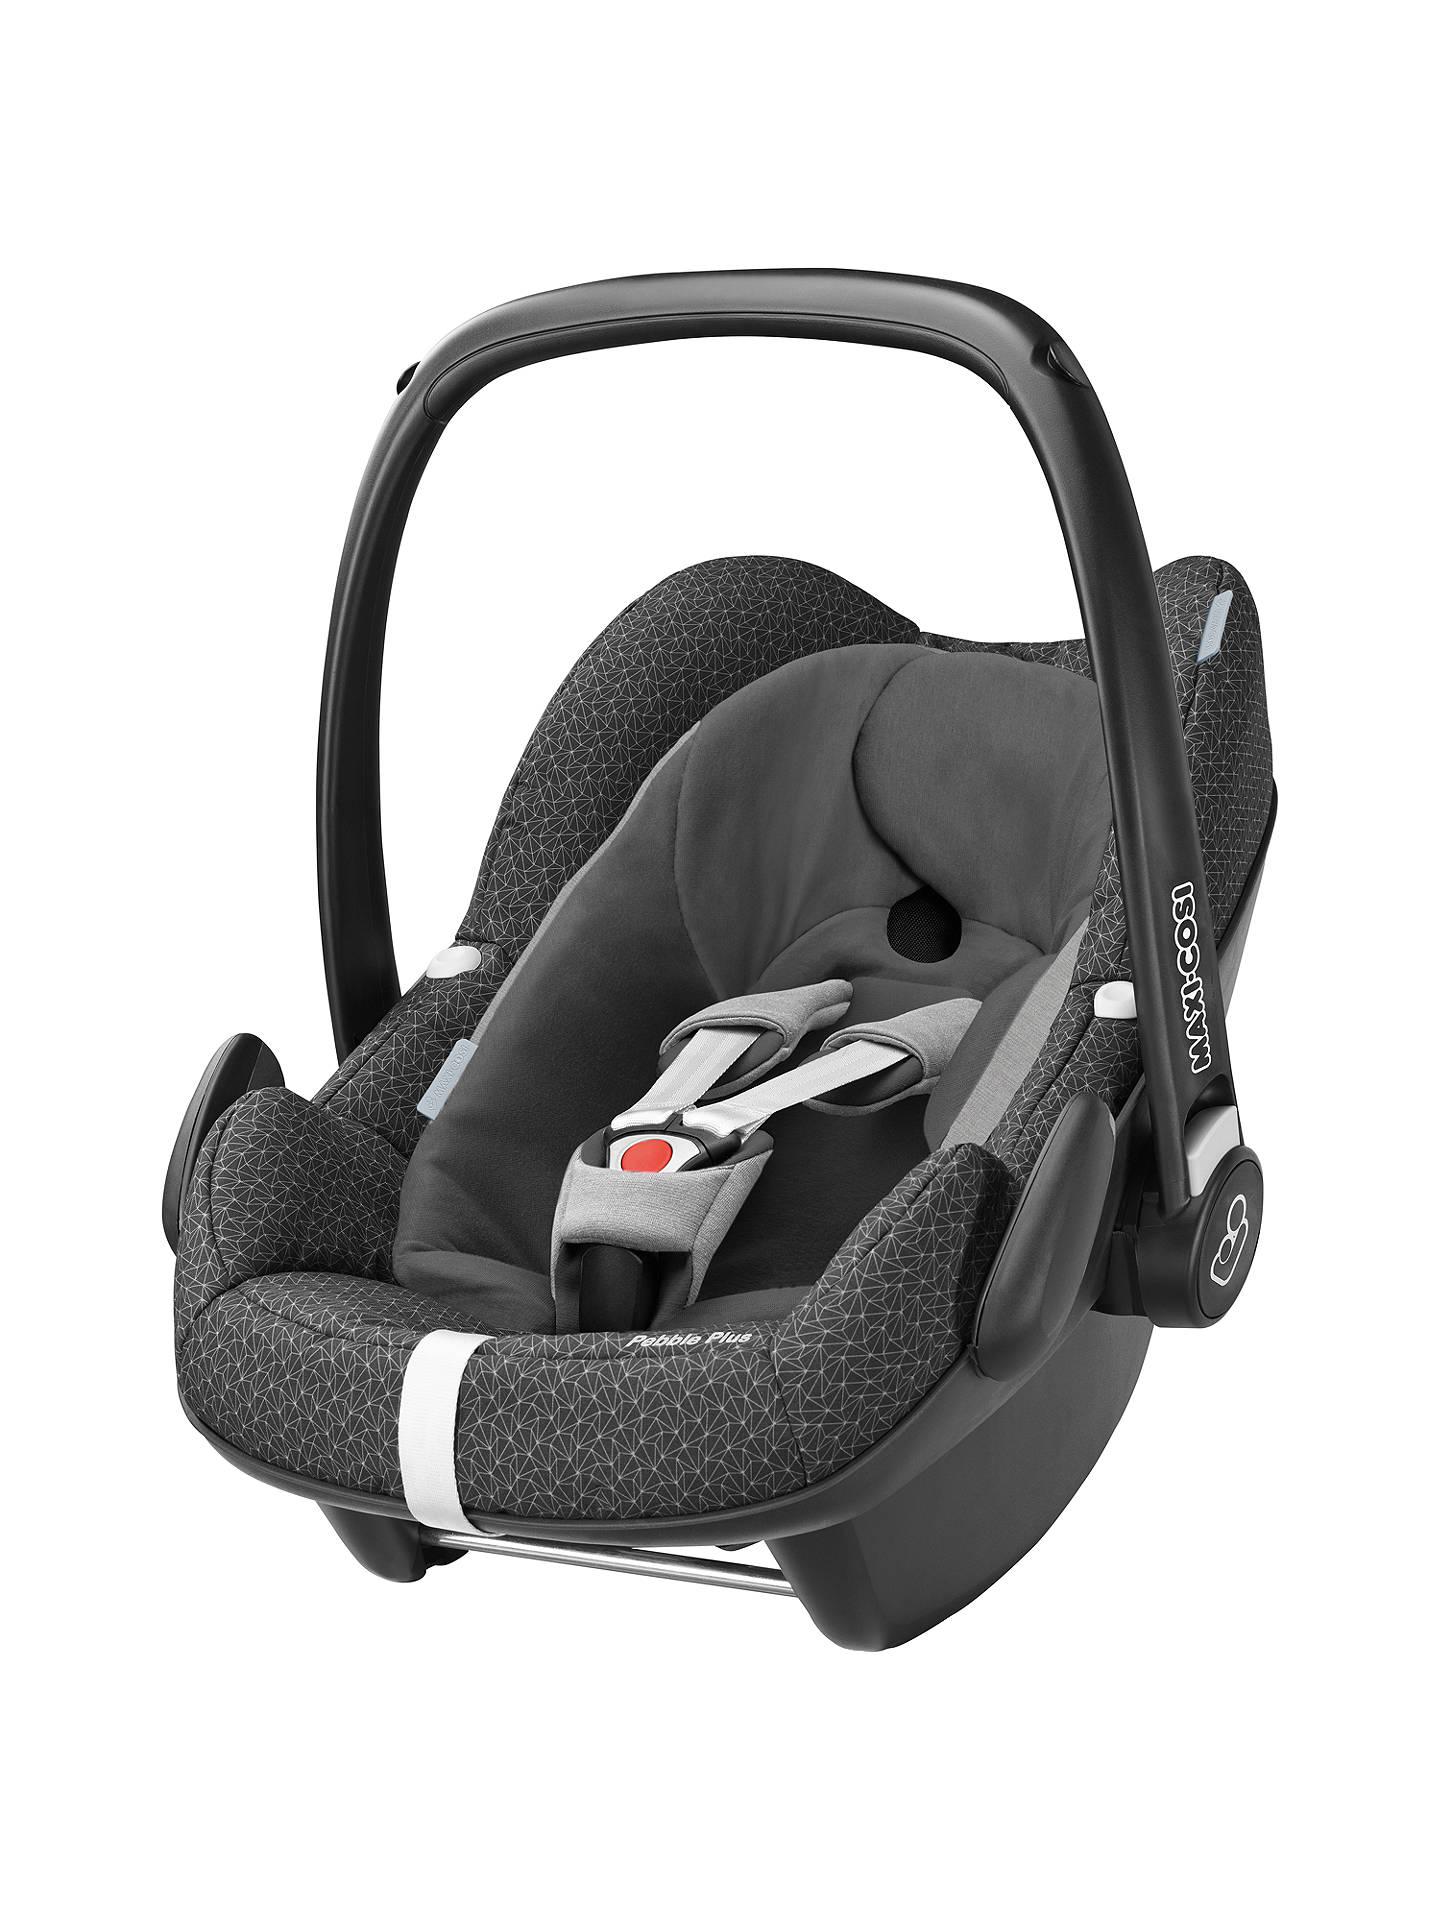 Maxi-Cosi Pebble Plus i-Size Group 0+ Baby Car Seat, Black ...